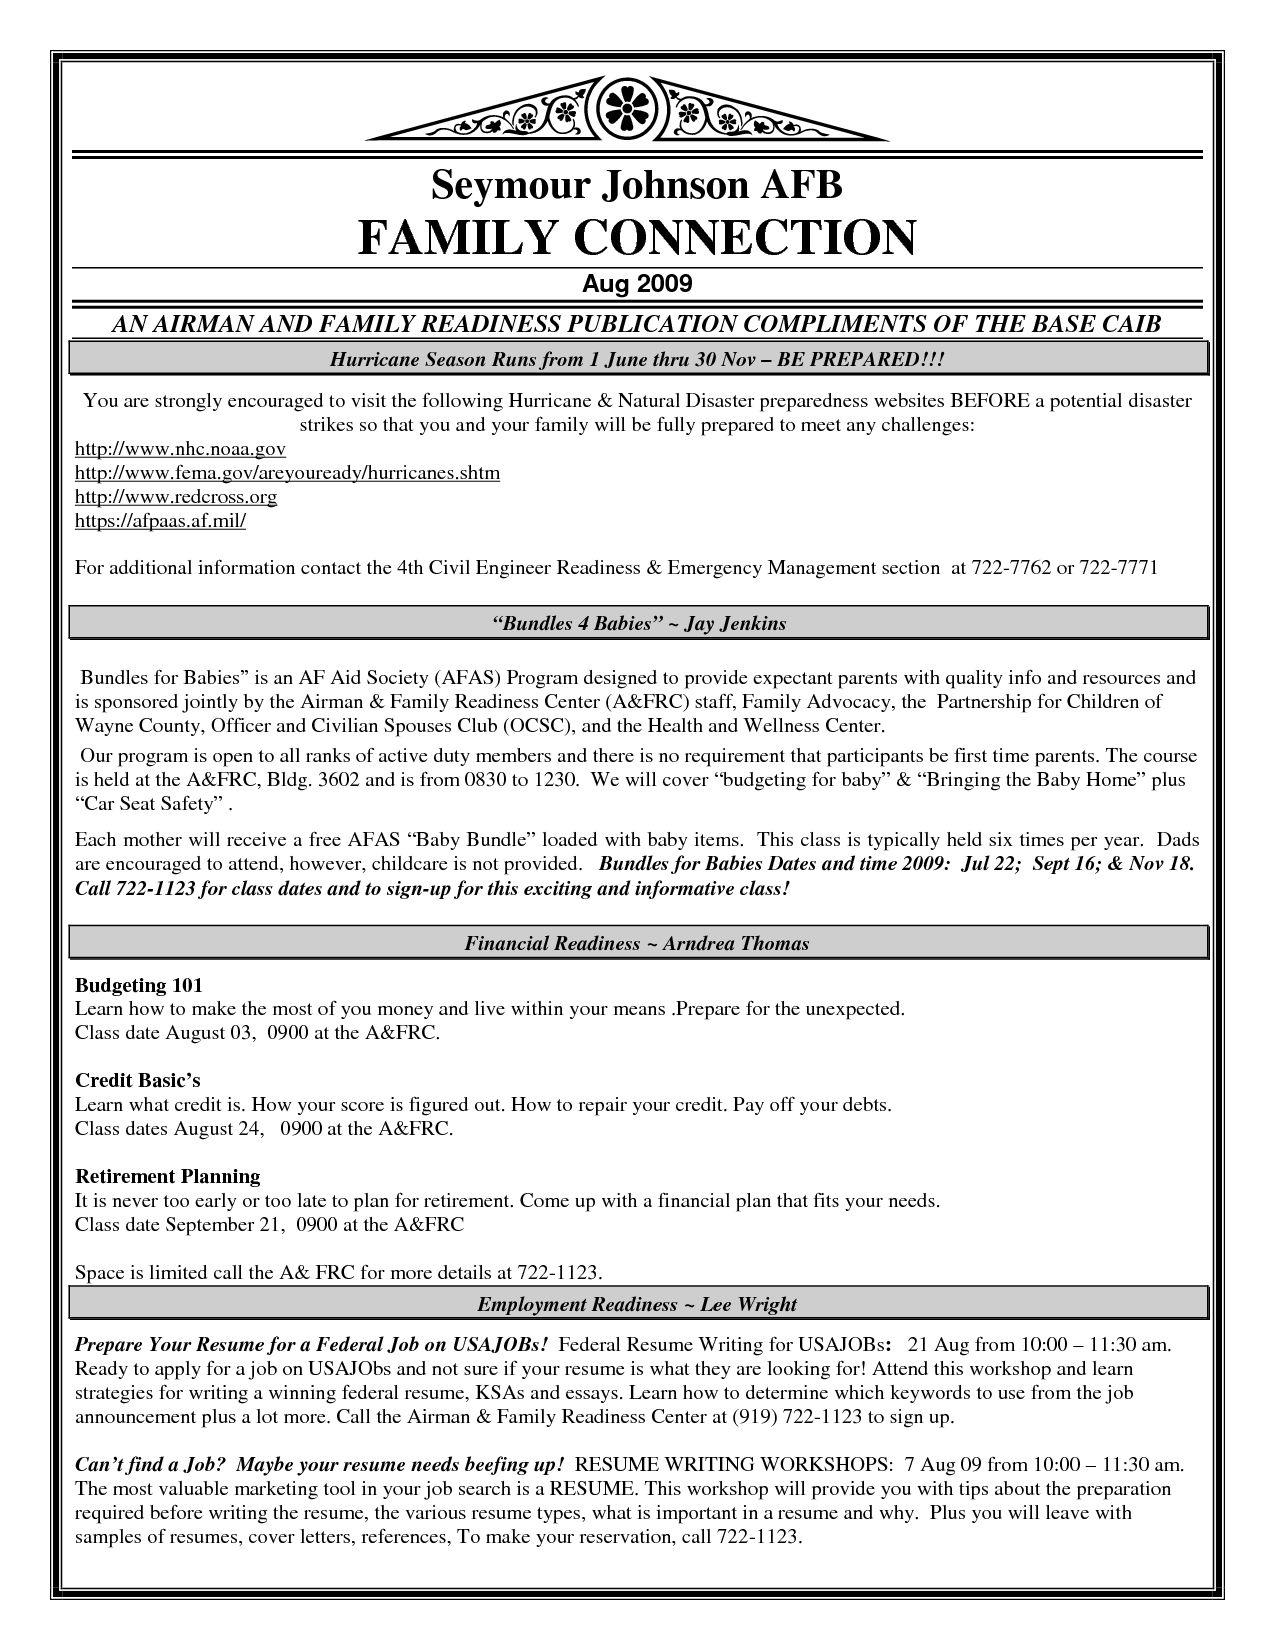 Free Resume Templates You Can Print Free printable